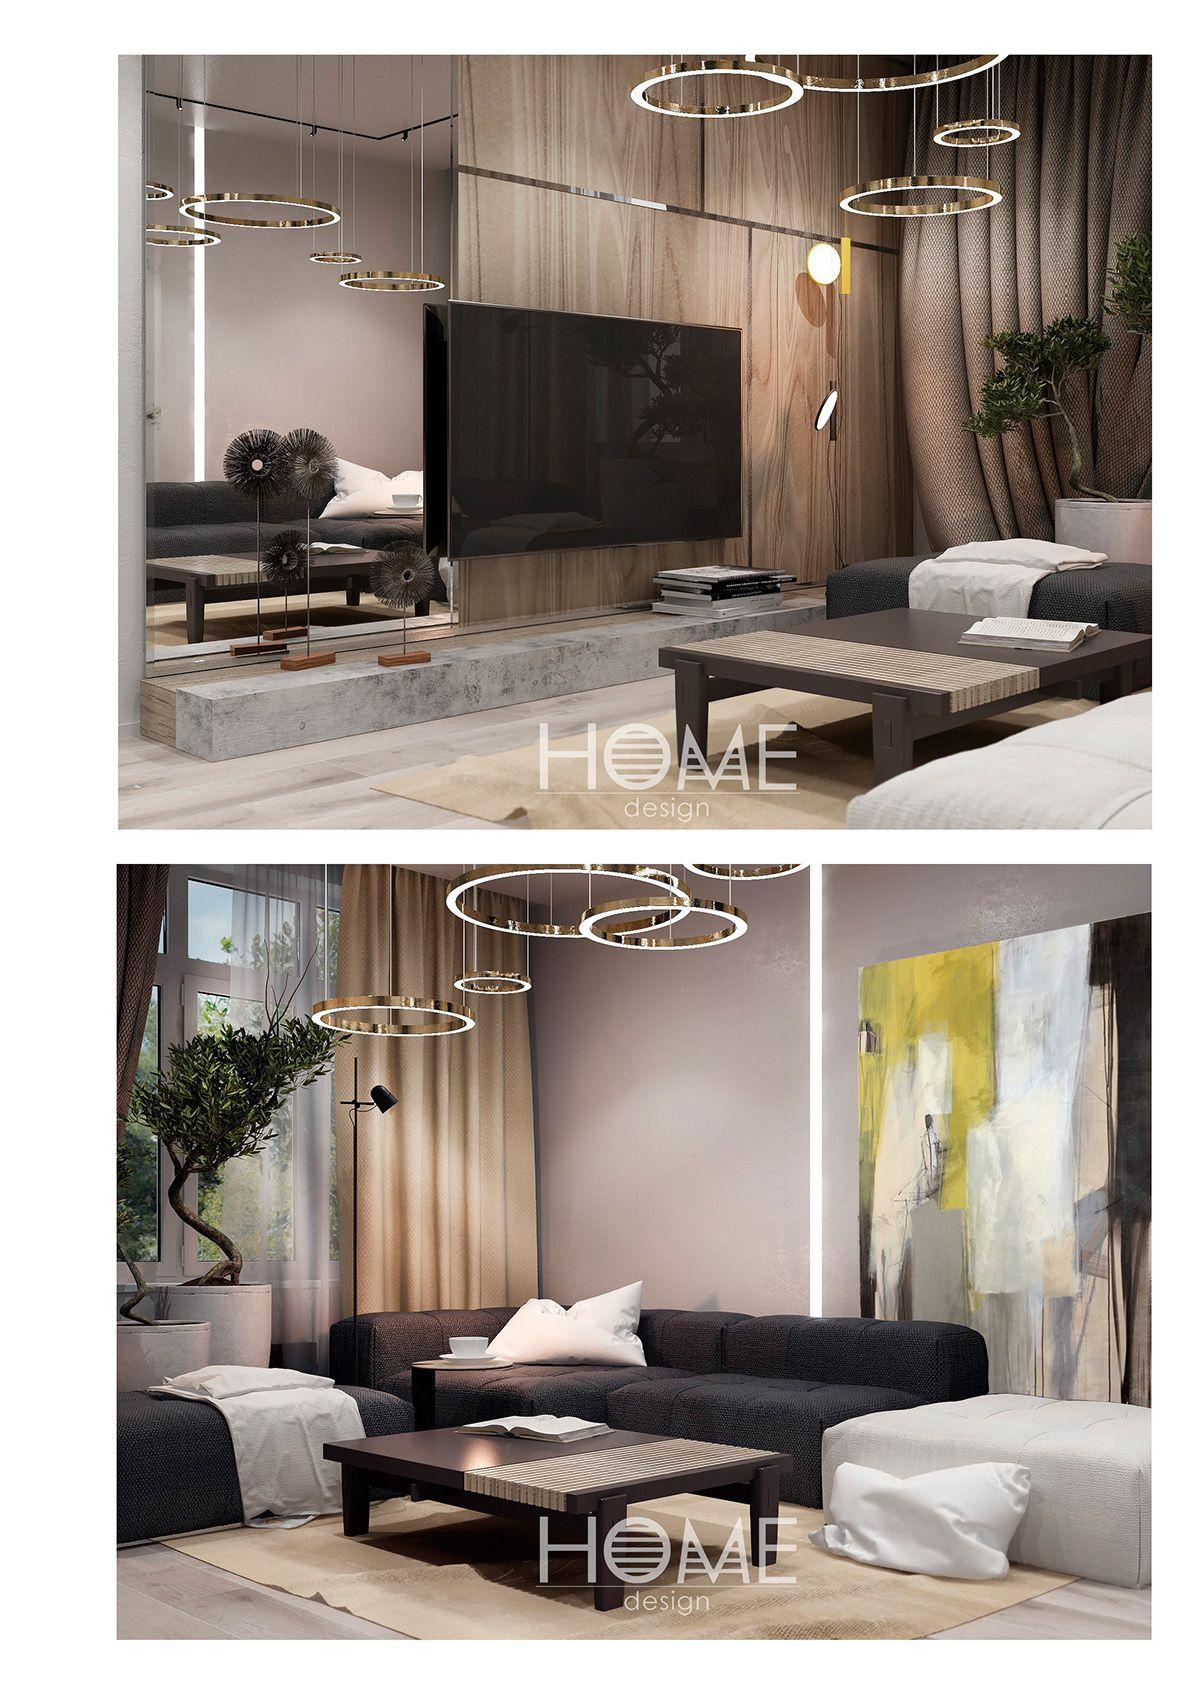 Small apartment in modern style. Современный стиль. on